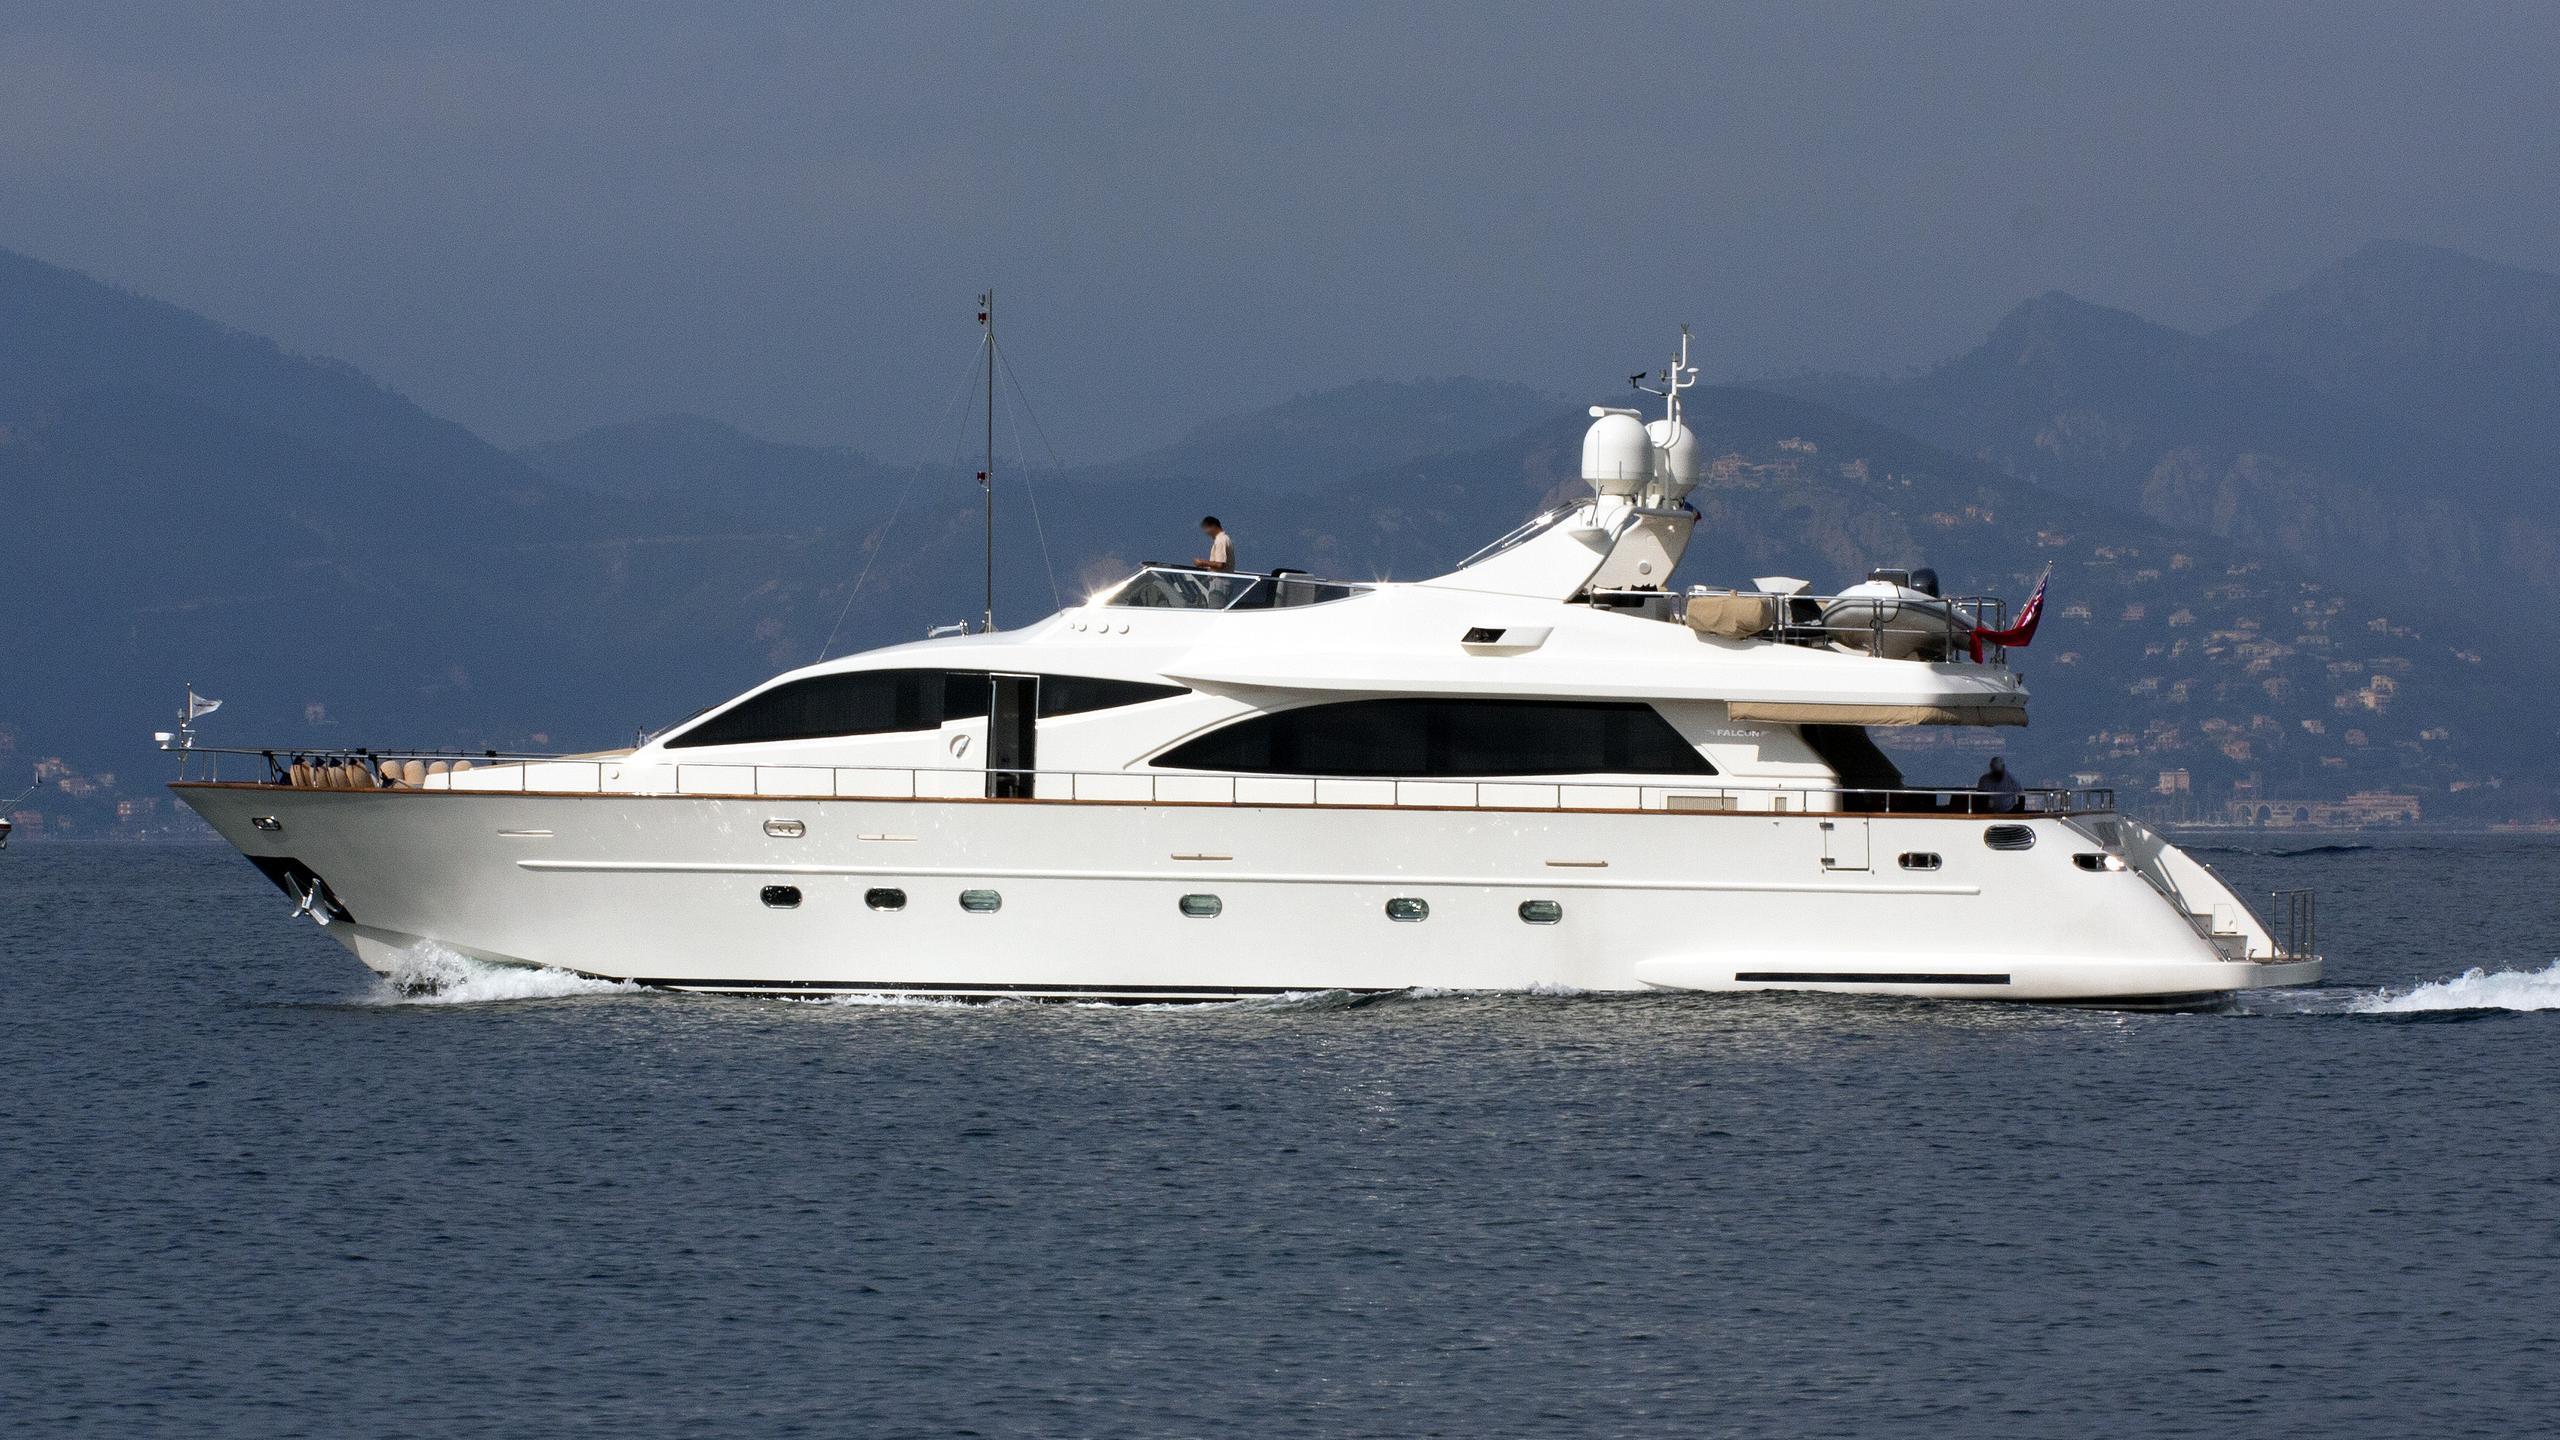 mosaic-motor-yacht-falcon-yachts-Falcon-90-2007-28m-cruising.jpeg